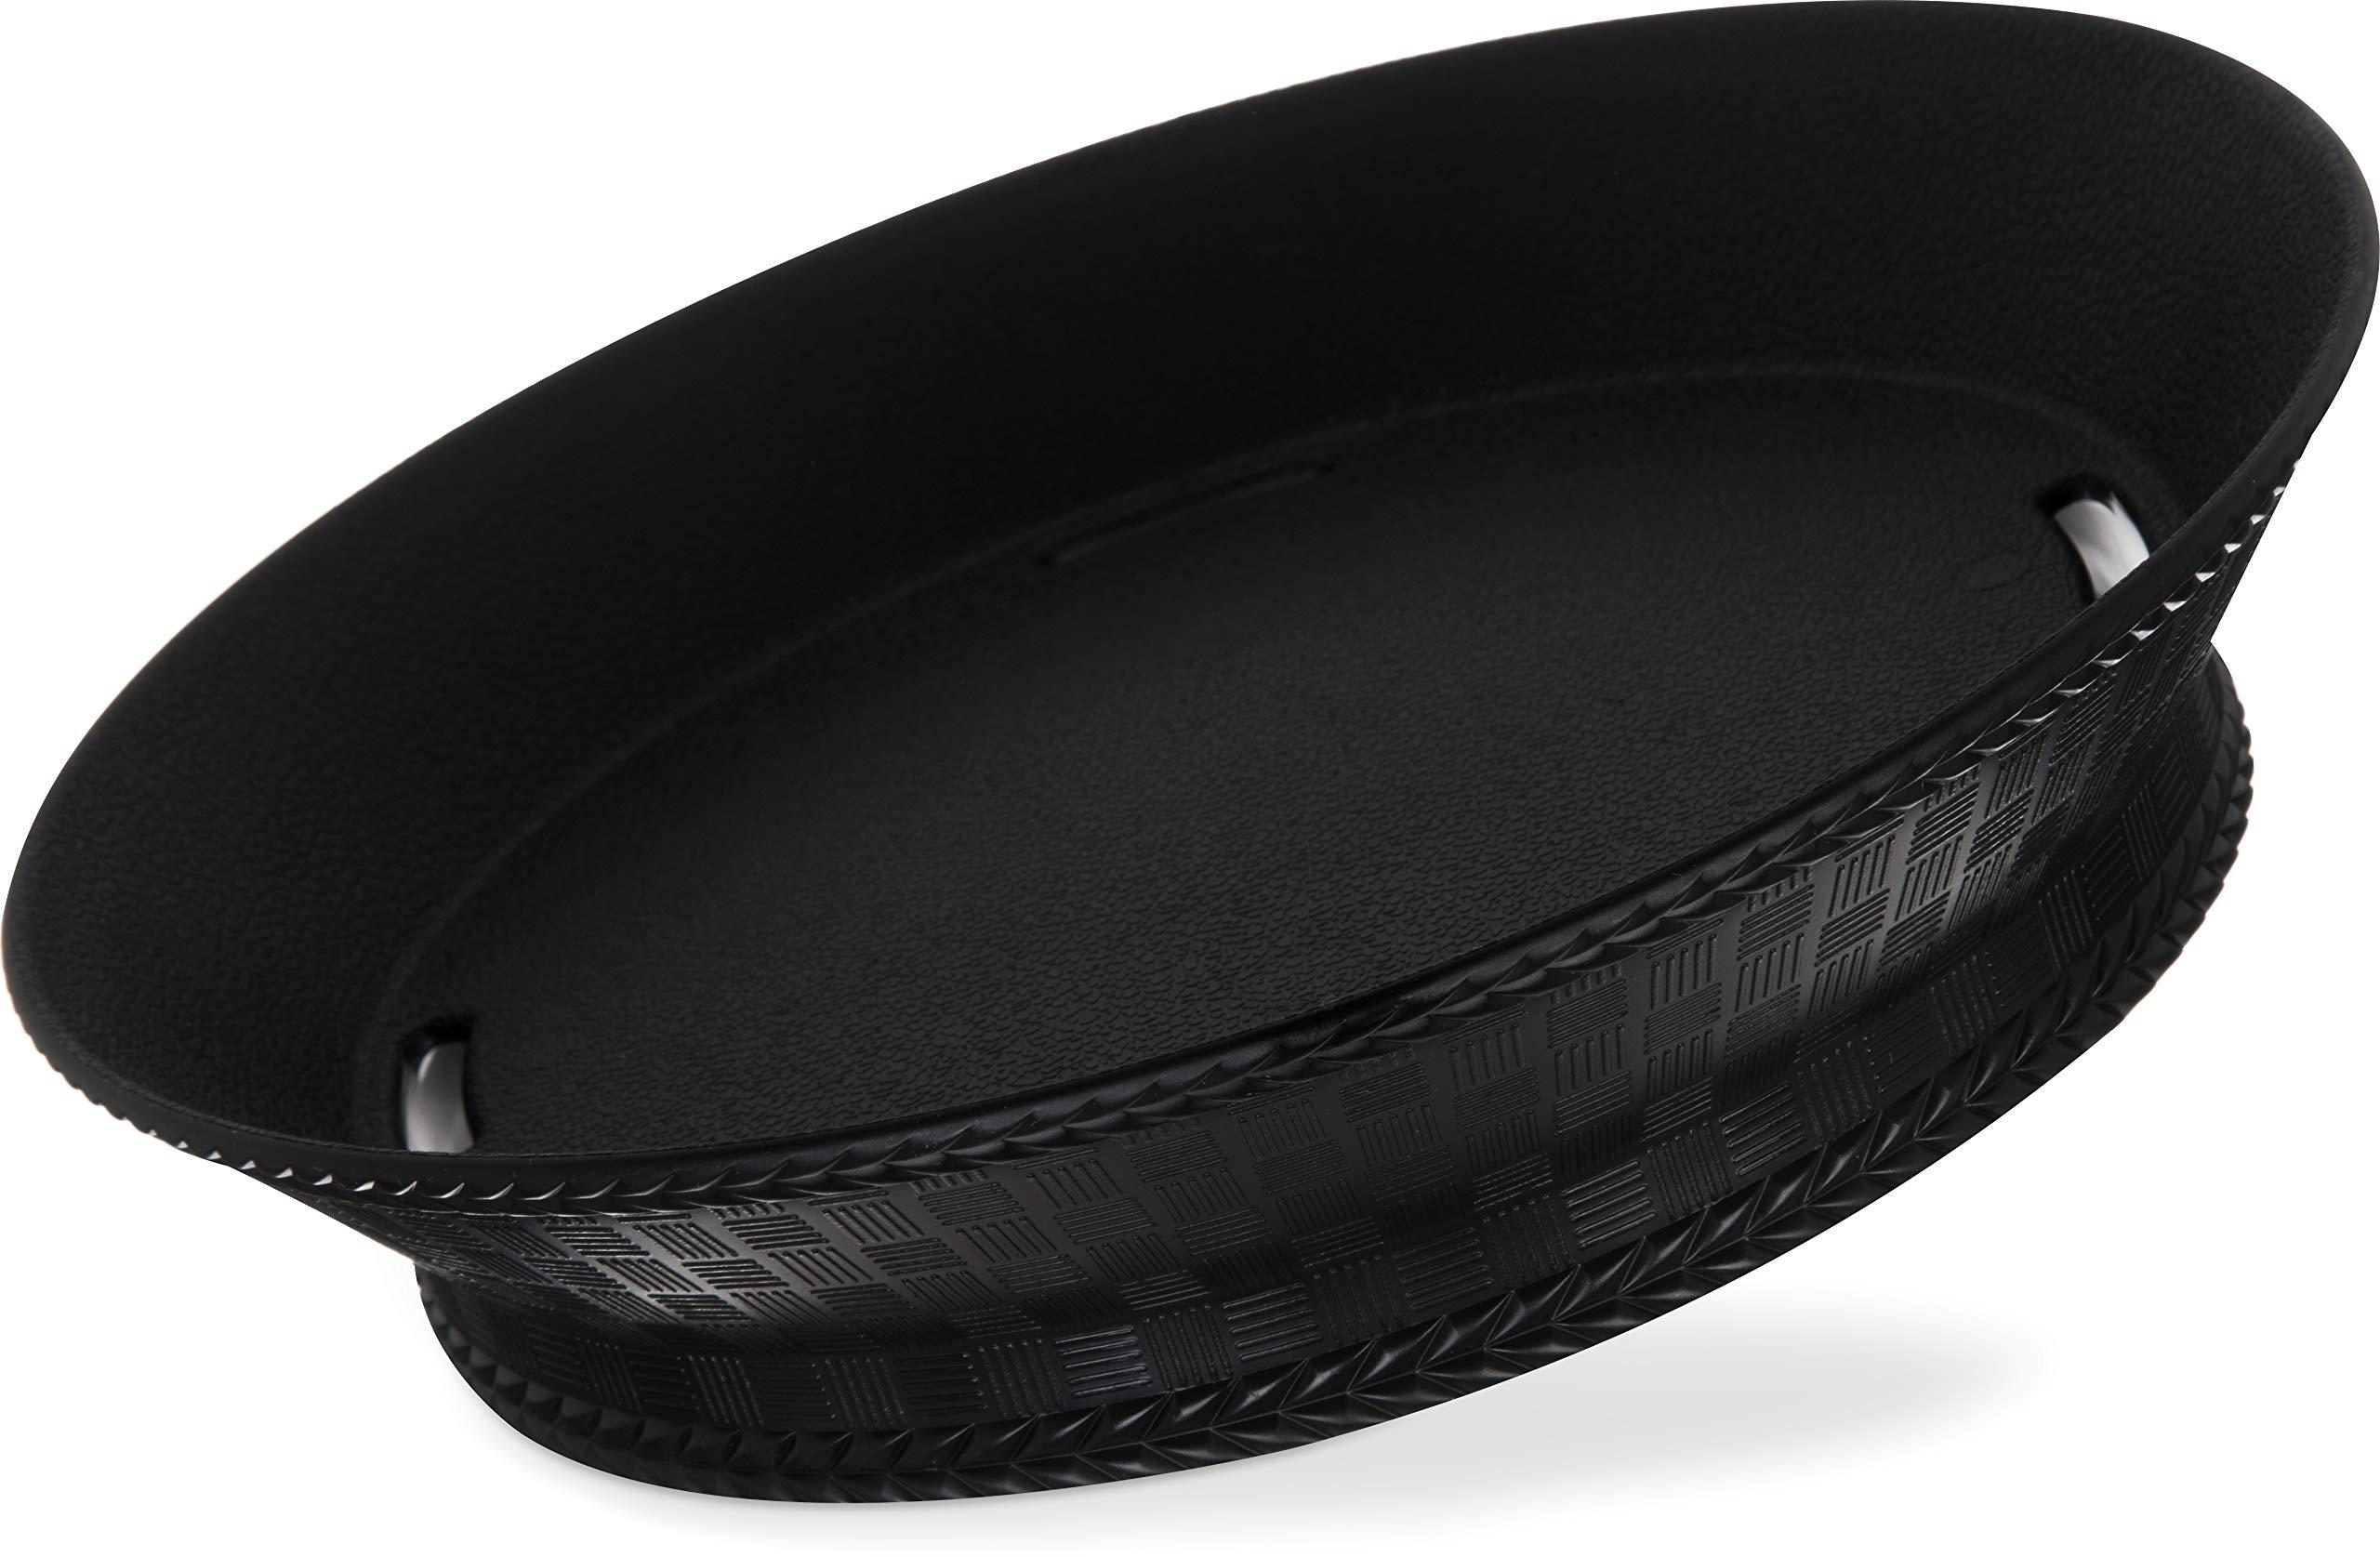 Carlisle 652803 WeaveWear Round Serving Basket, 9'', Black (Pack of 12) by Carlisle (Image #2)